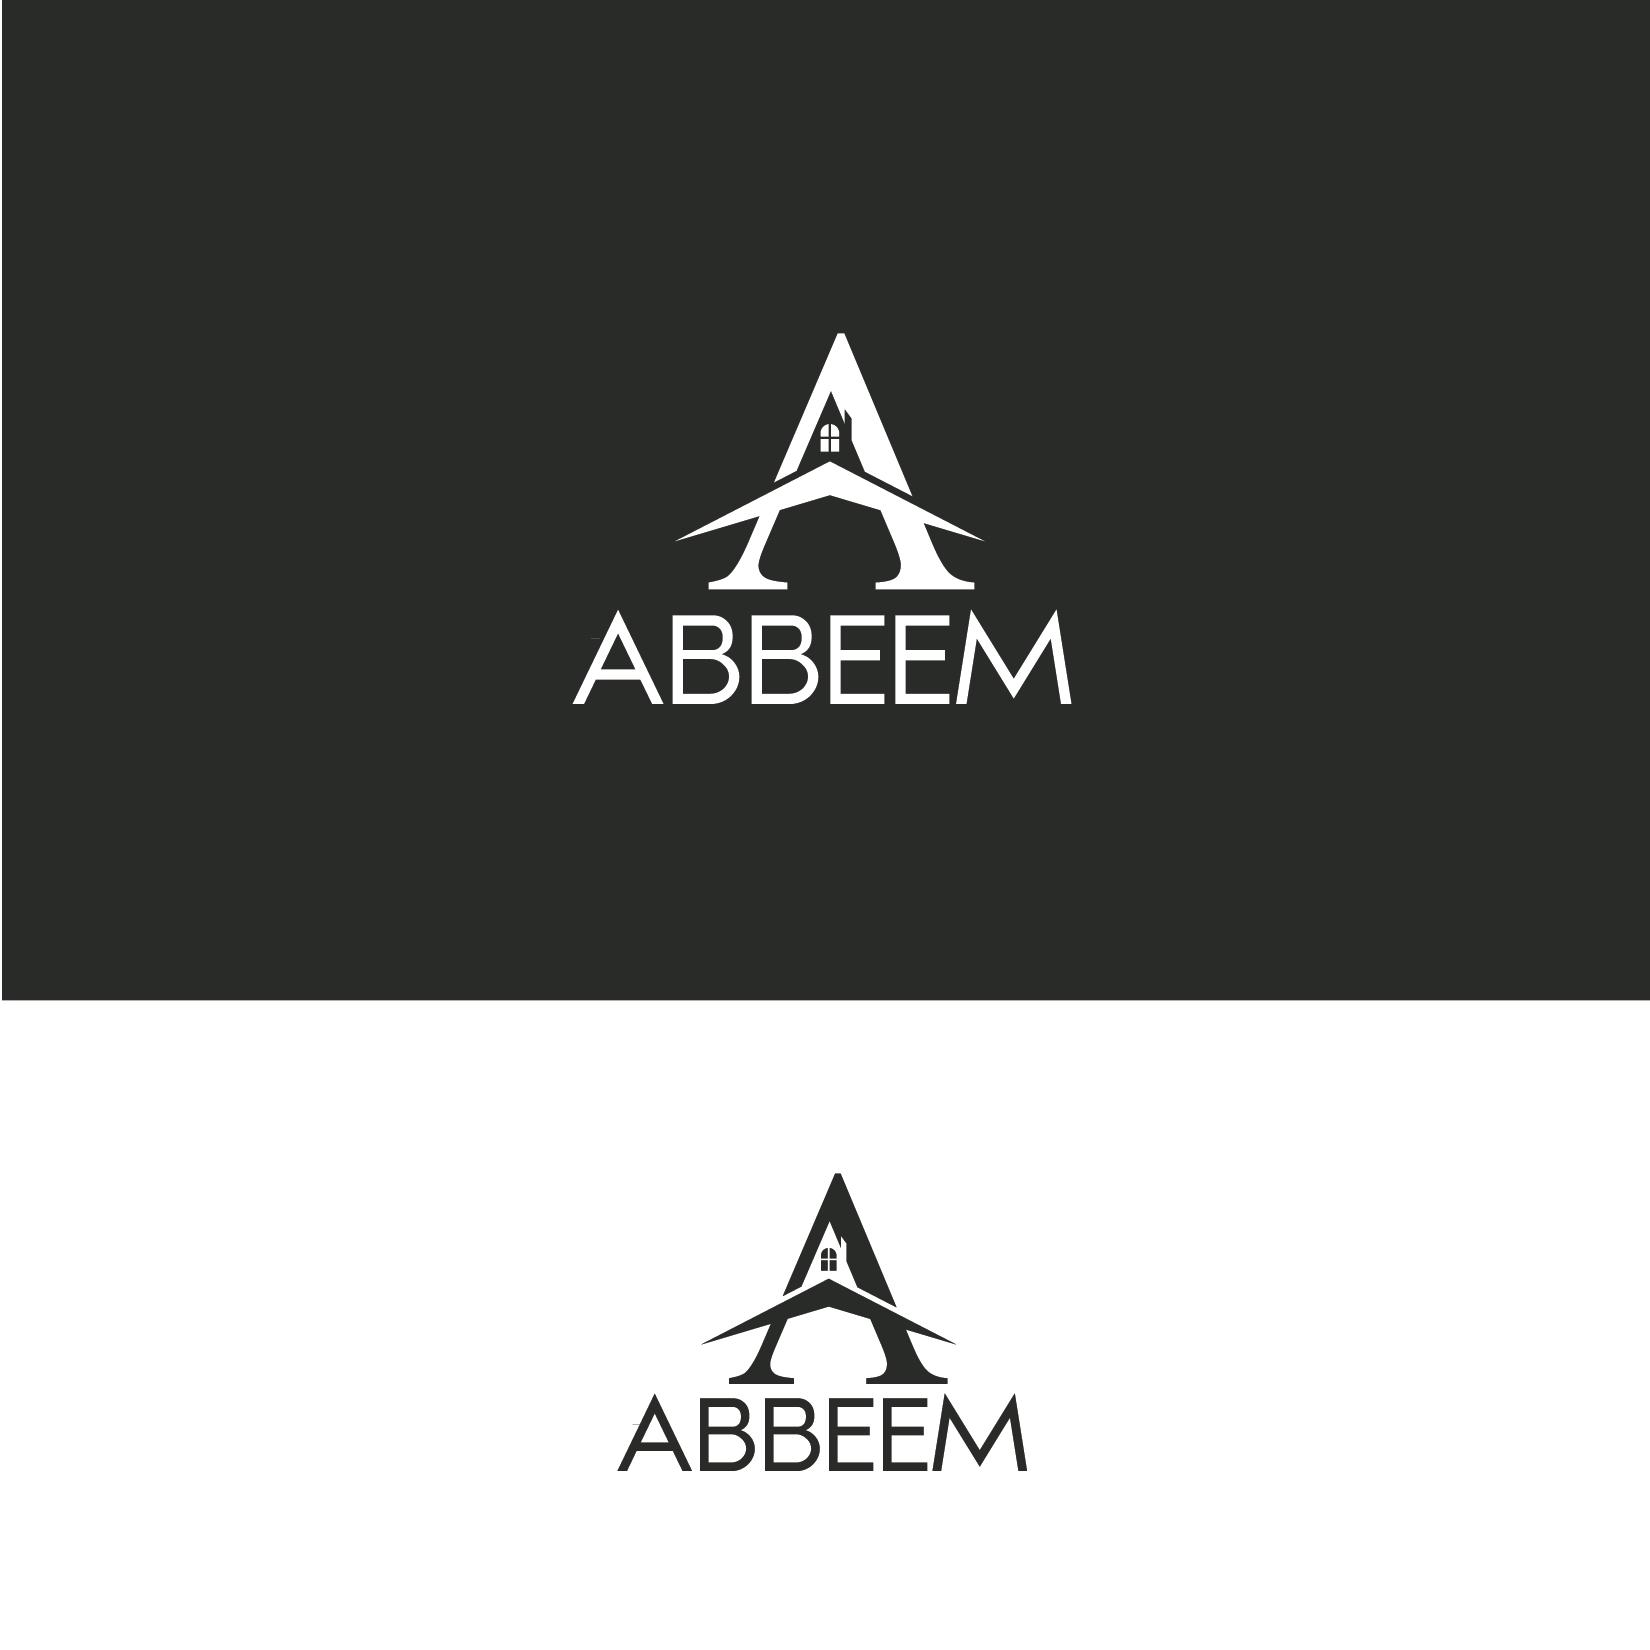 Logo Design by Private User - Entry No. 72 in the Logo Design Contest Luxury Logo Design for Abbeem.